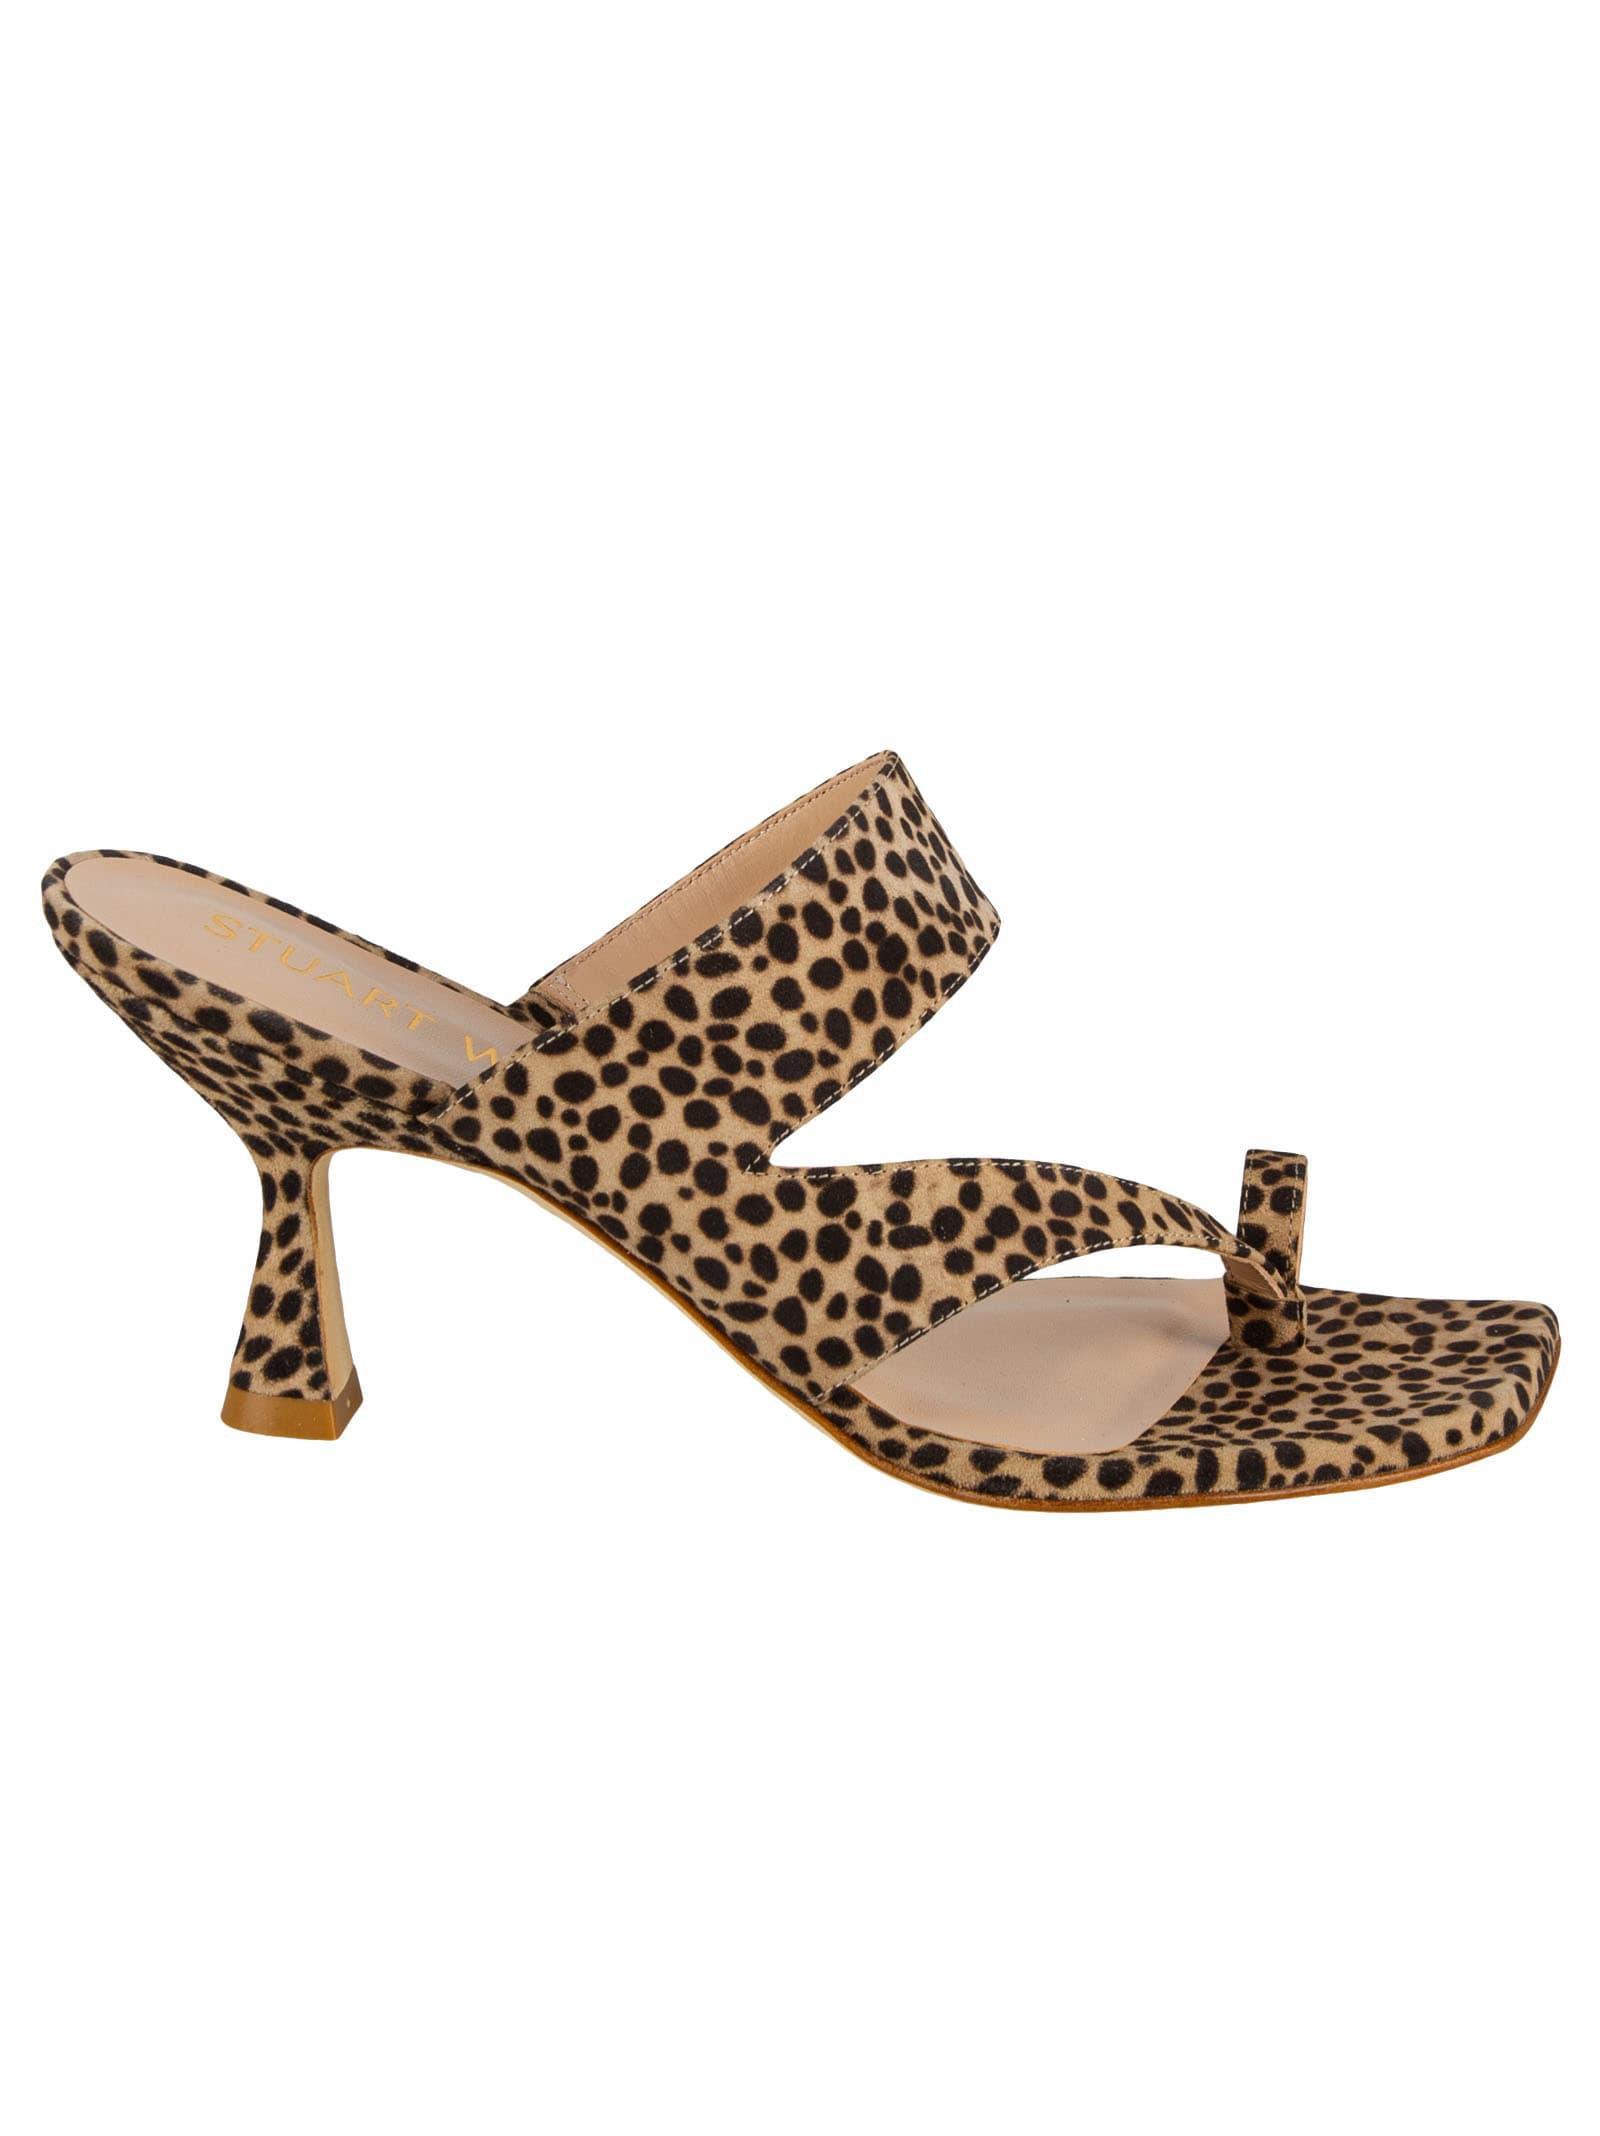 Buy Stuart Weitzman Lyla 75 Sandals online, shop Stuart Weitzman shoes with free shipping